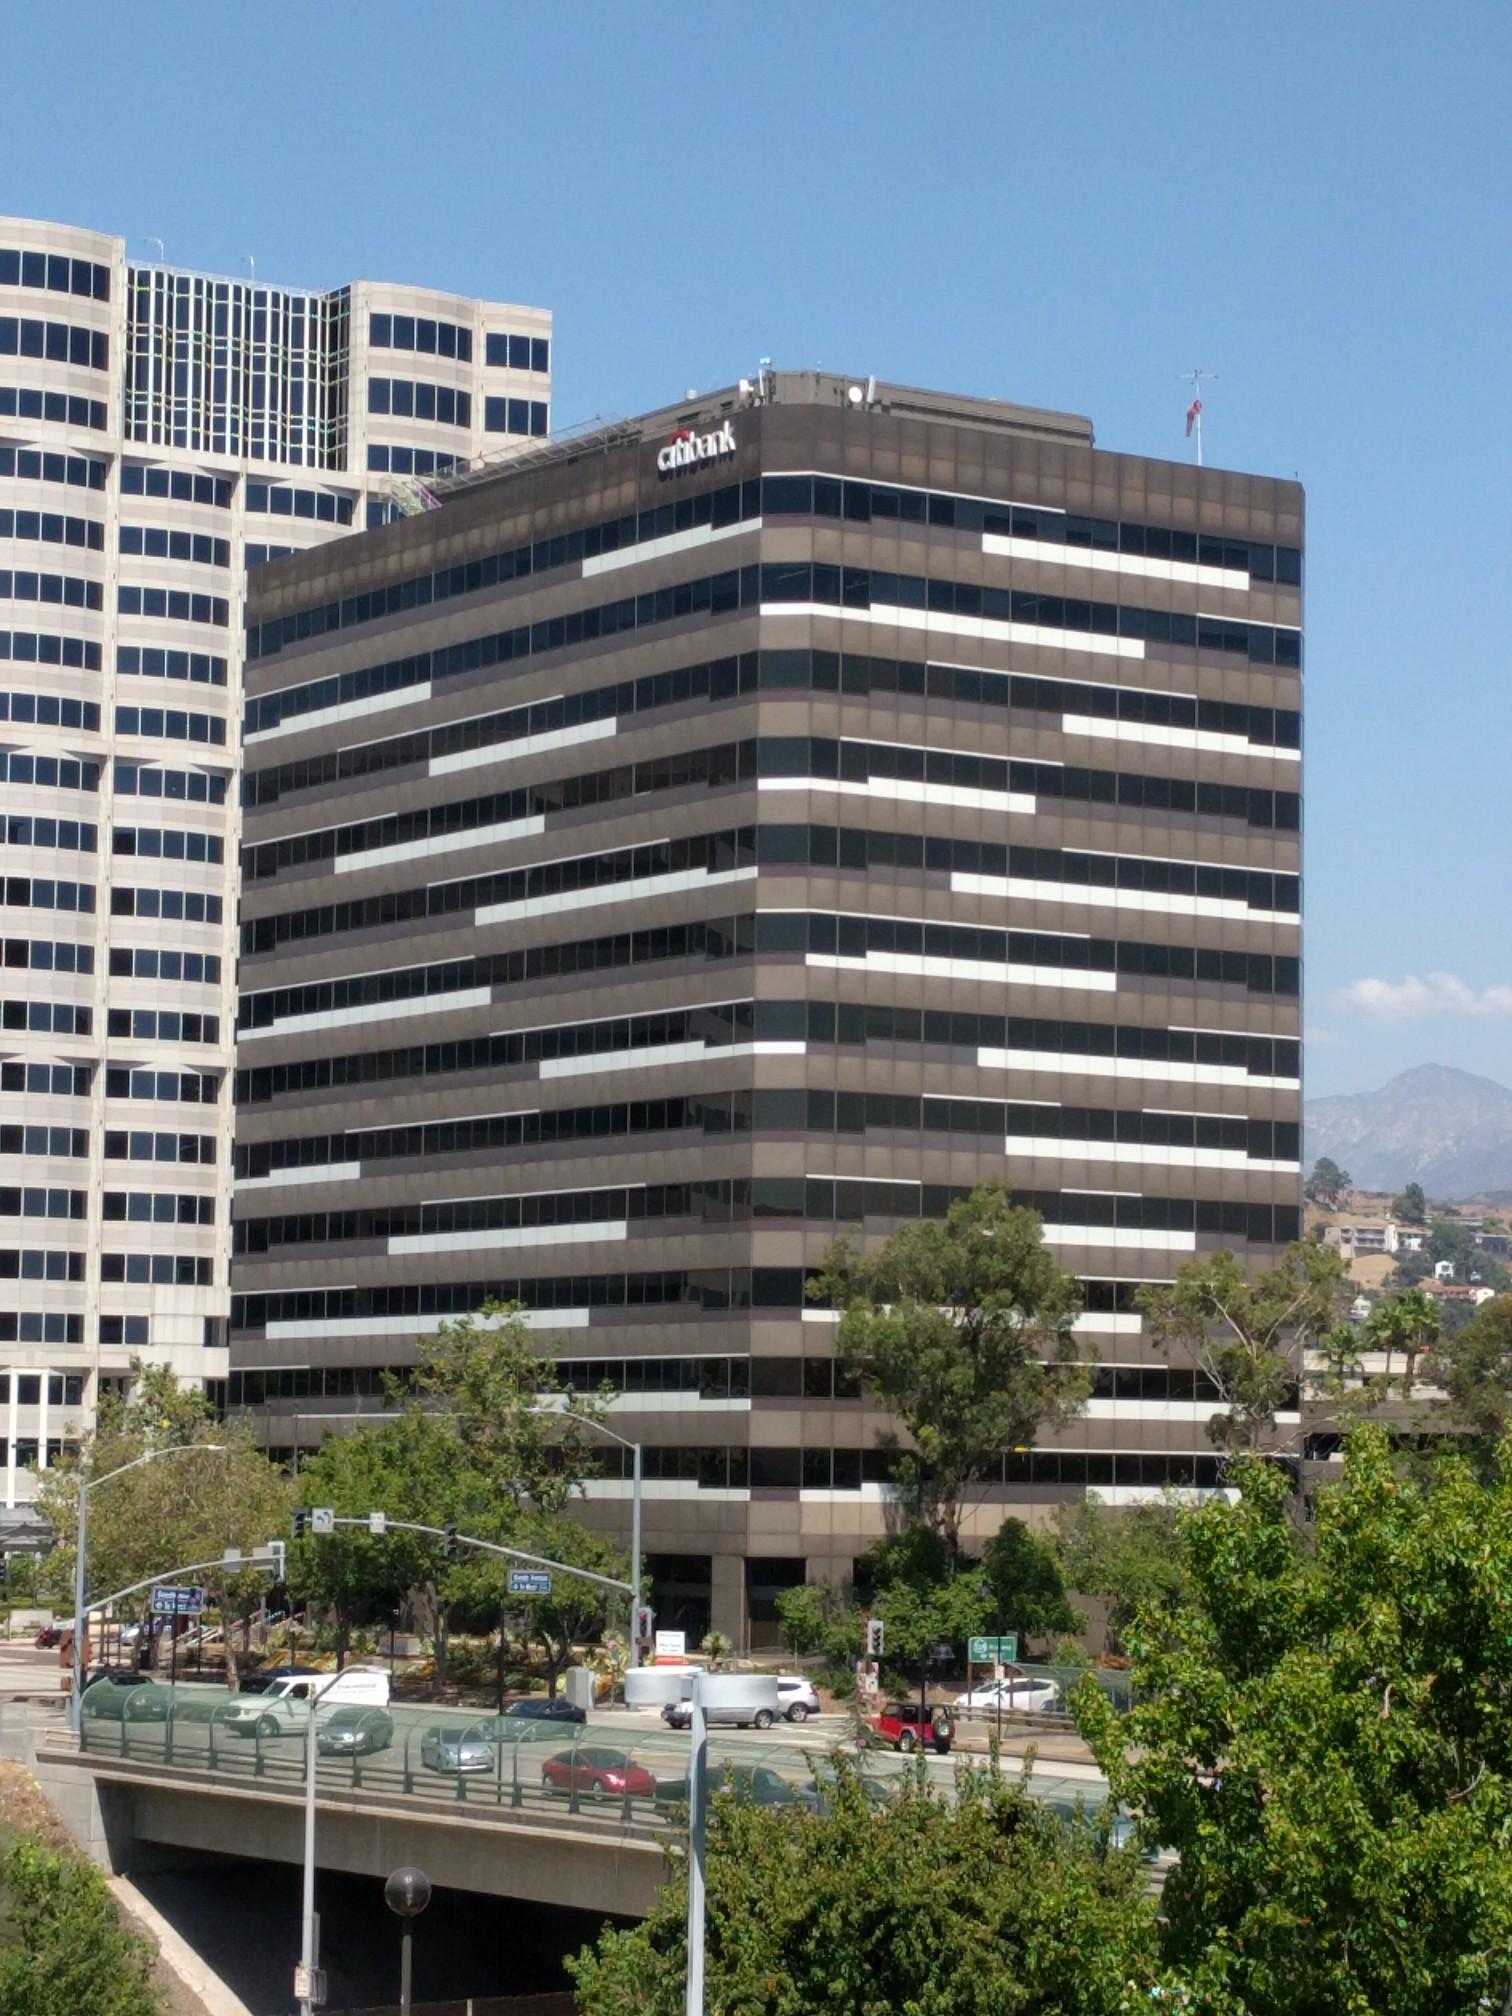 Citibank Glendale